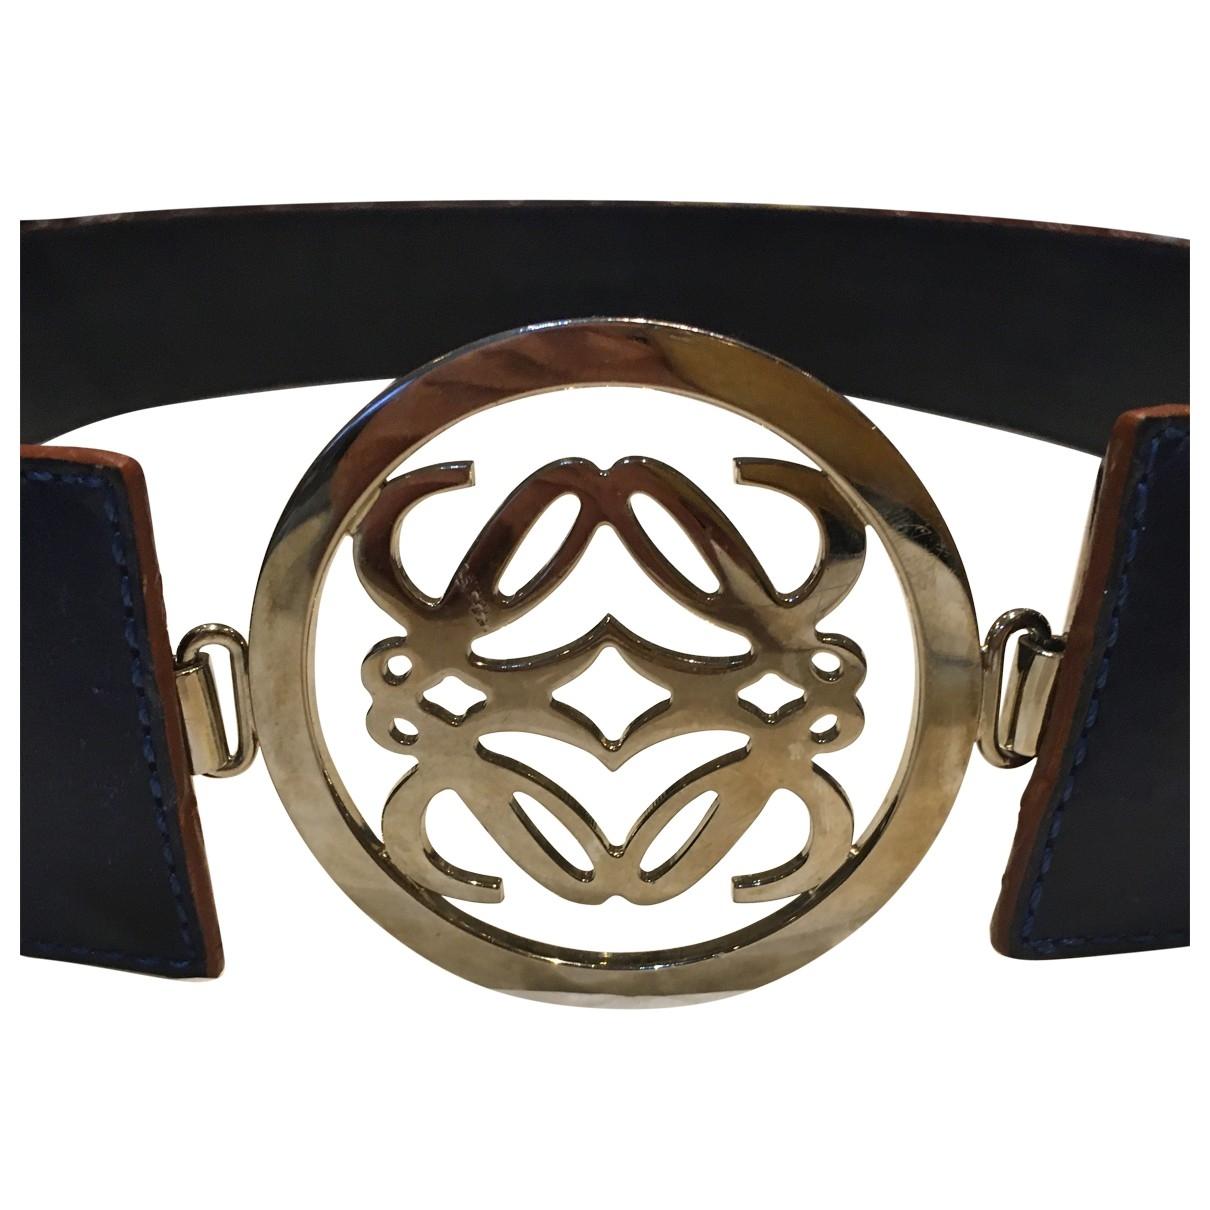 Loewe \N Leather belt for Women M International